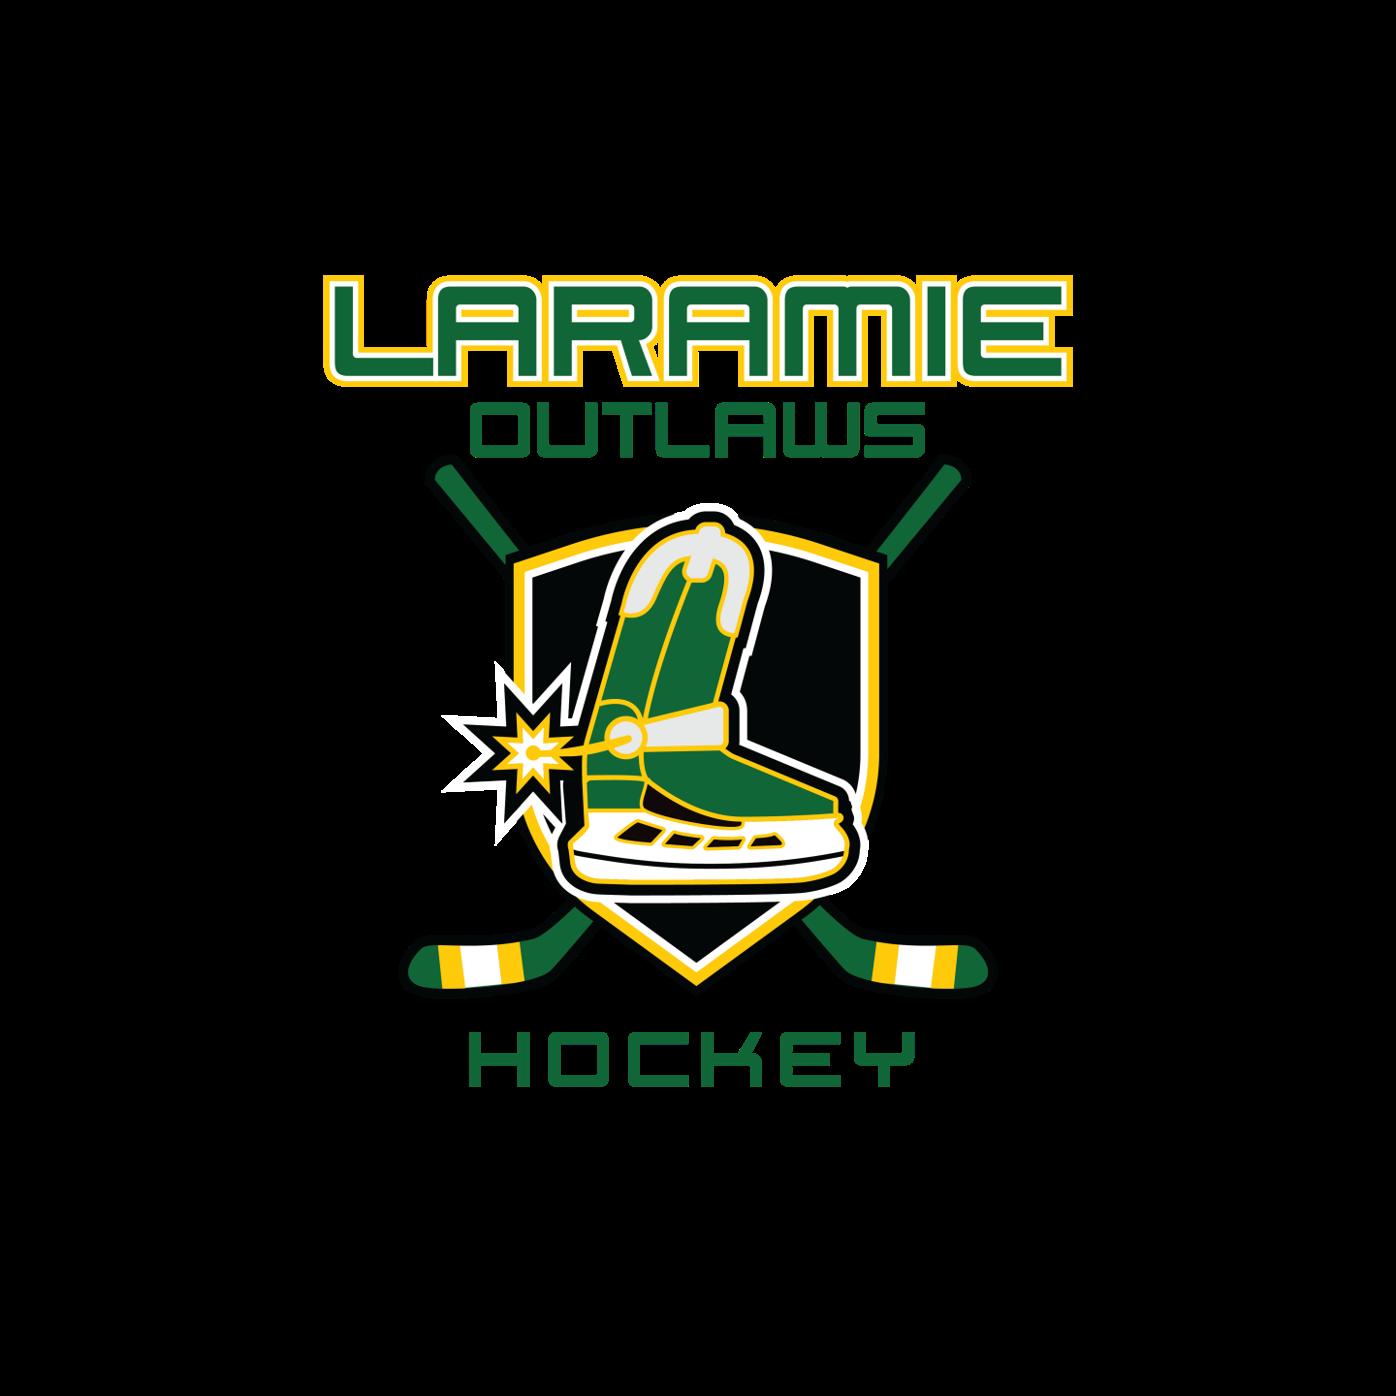 Laramie Outlaws Hockey logo